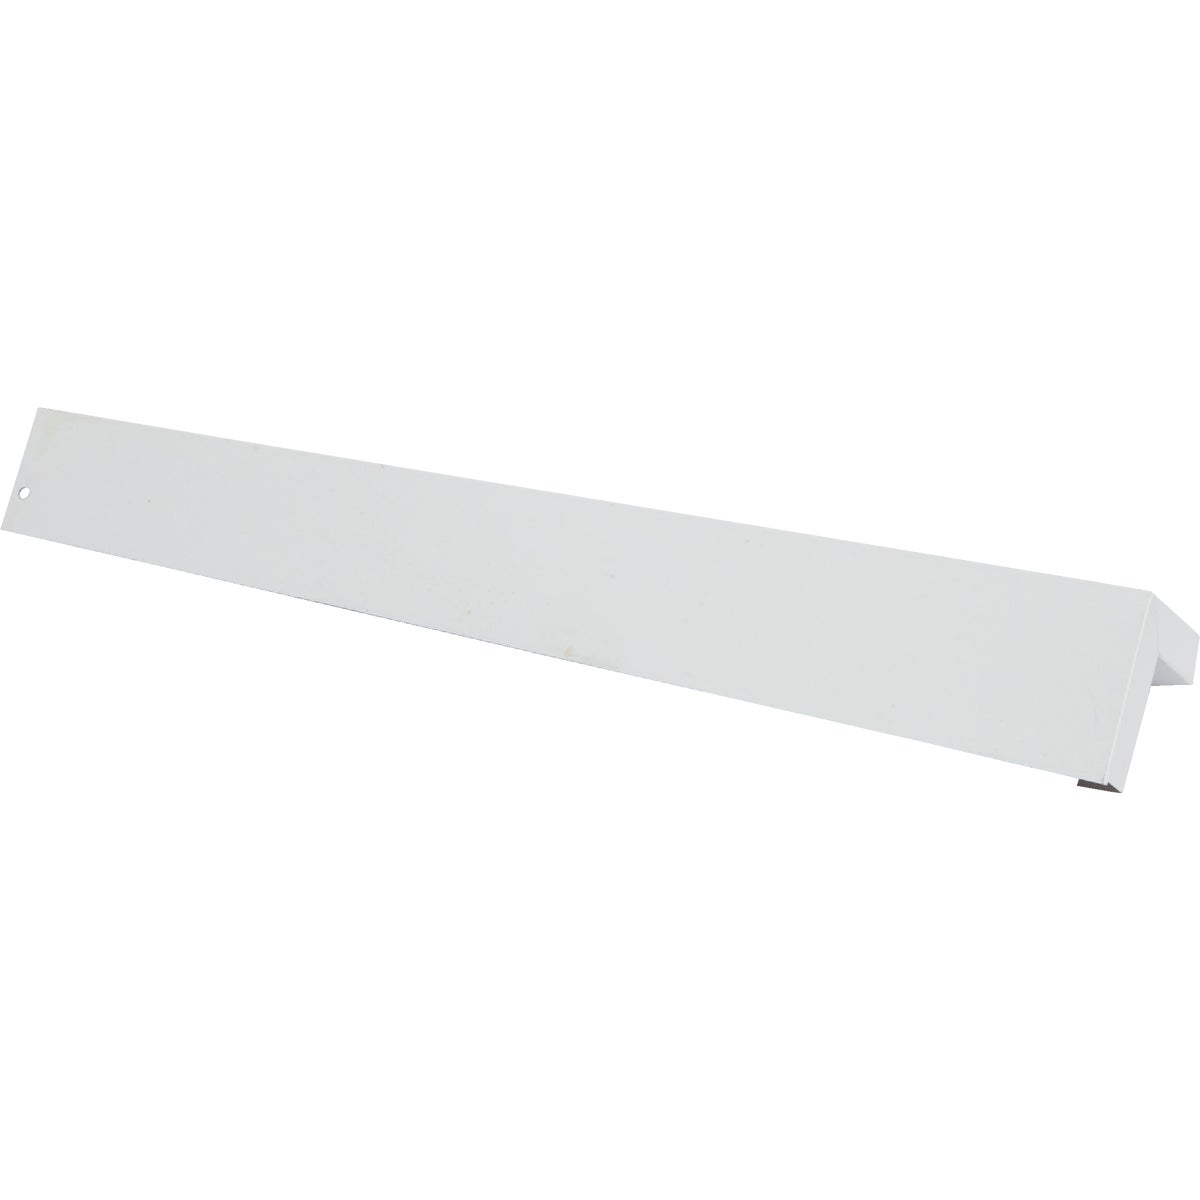 Amerimax White Aluminum Siding Corner, 61026